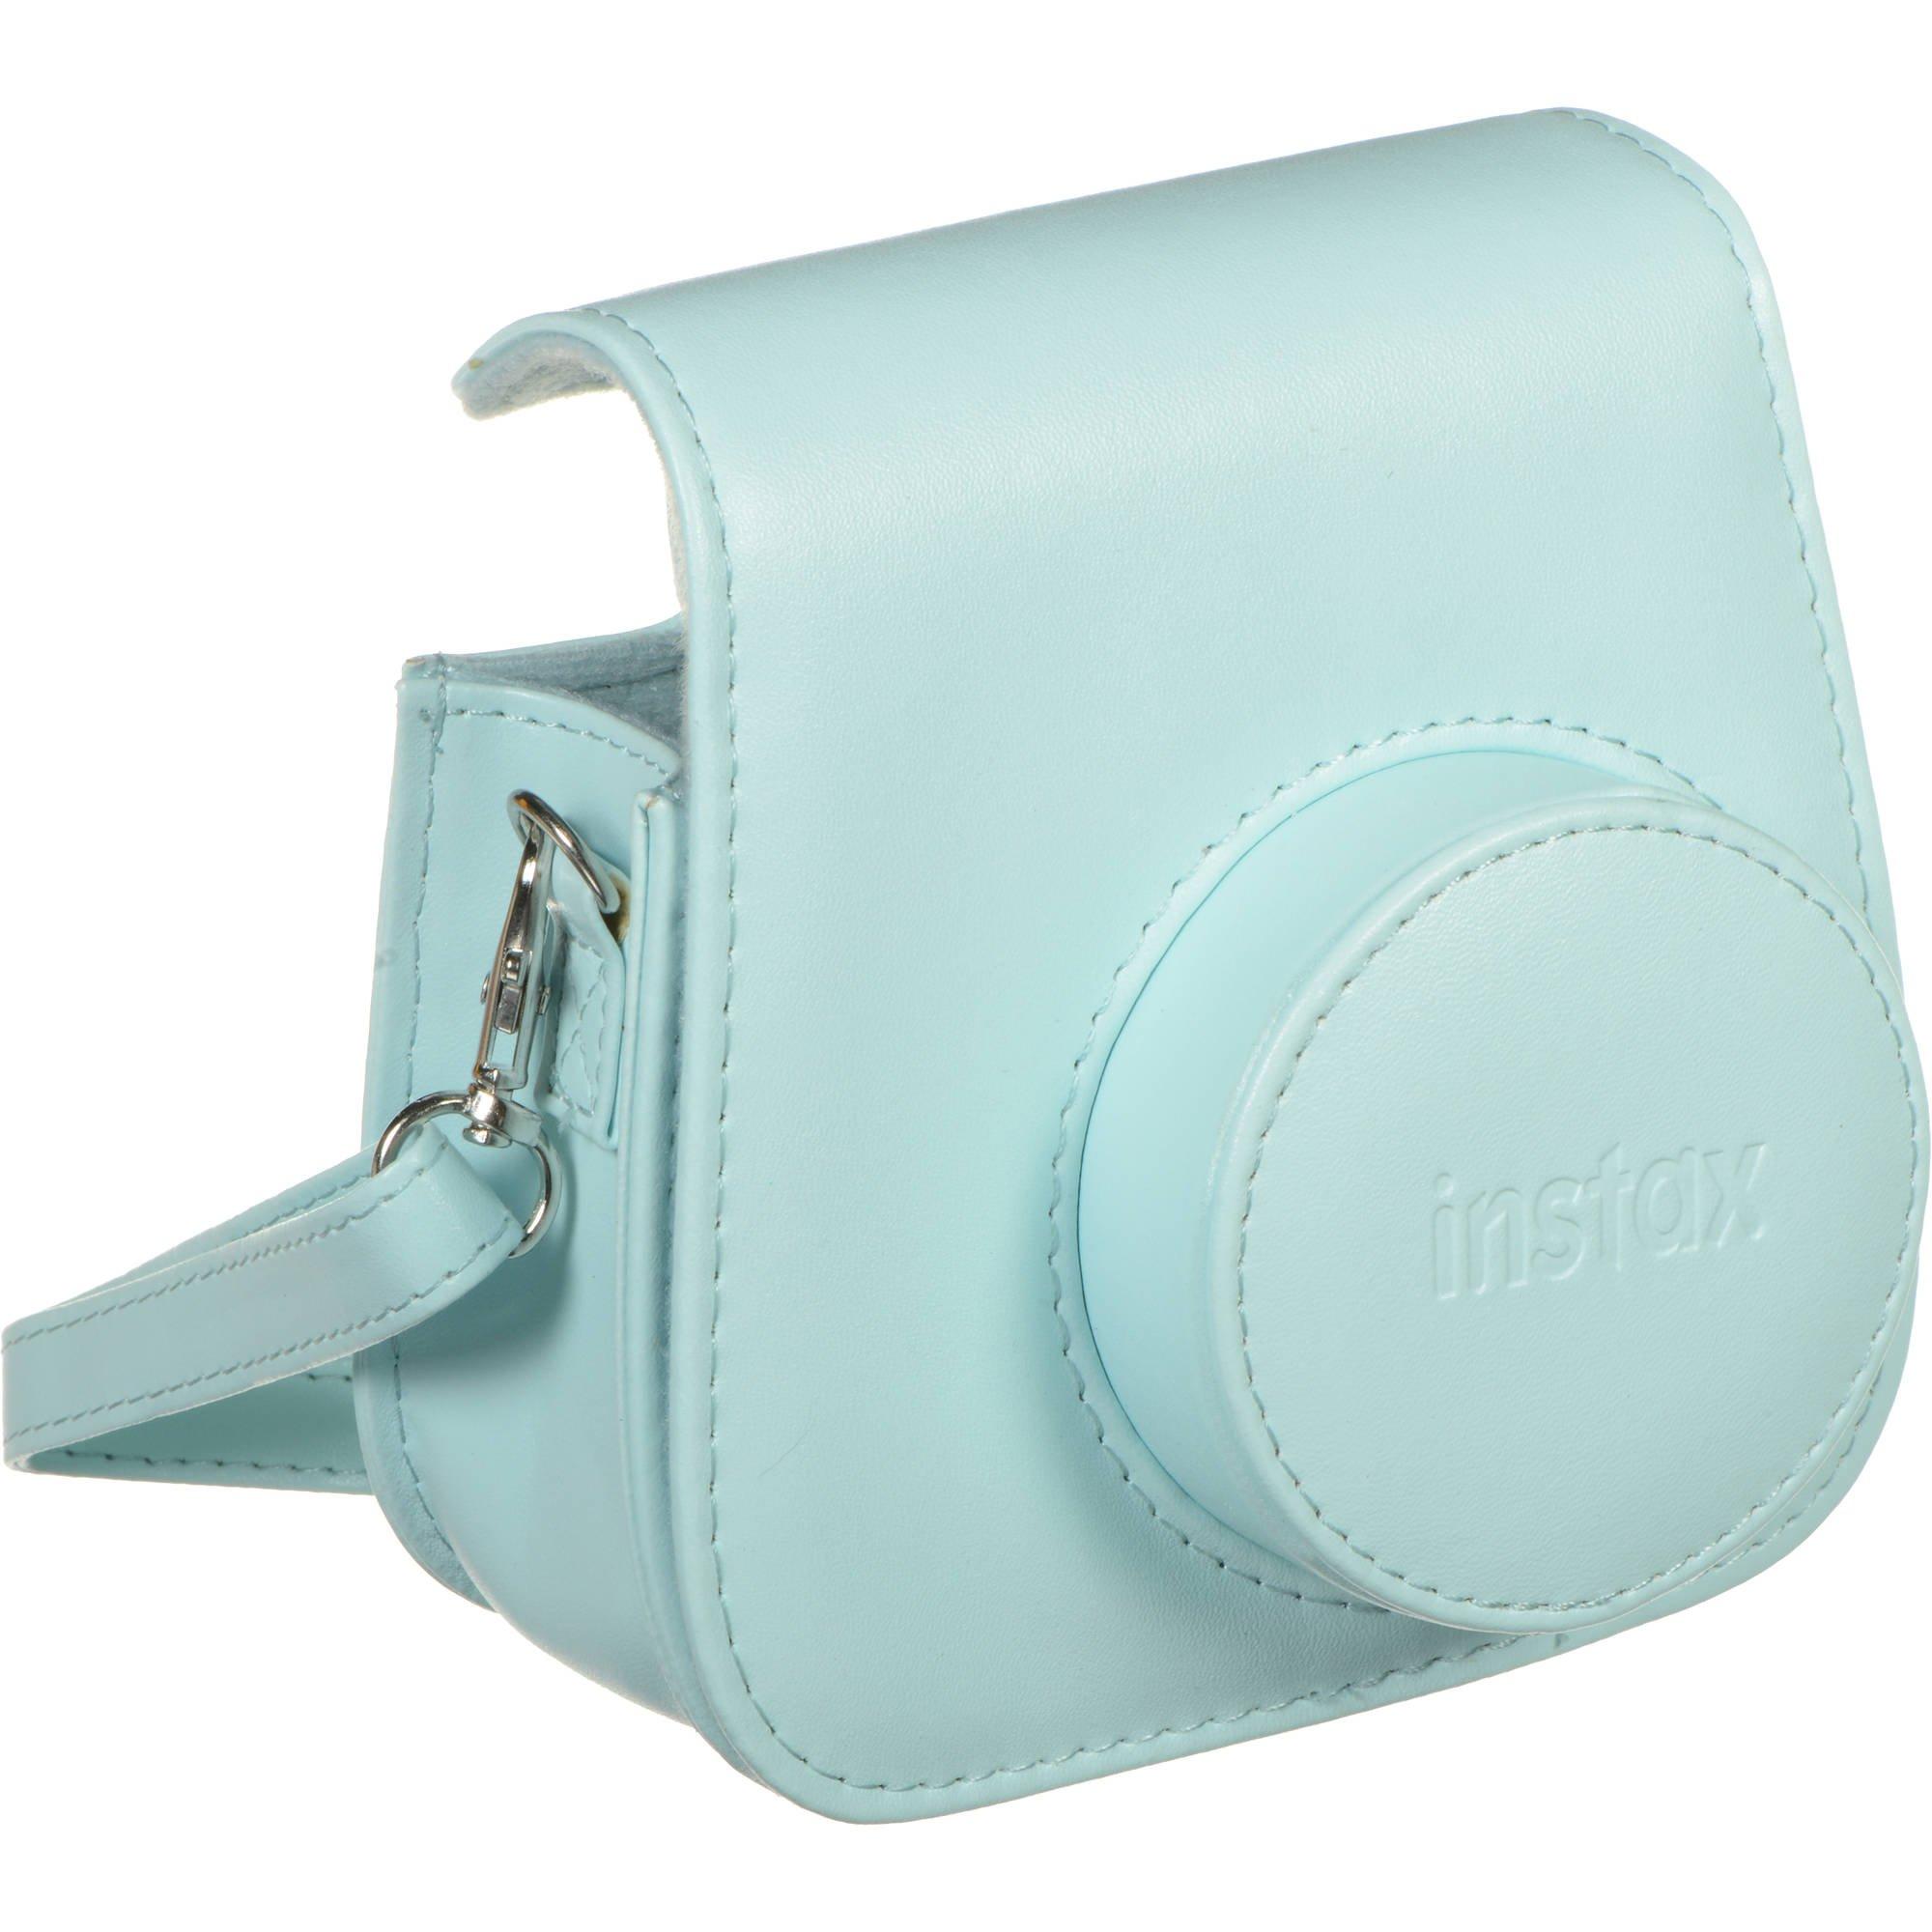 FUJIFILM INSTAX  pouzdro MINI 9 - světle modré